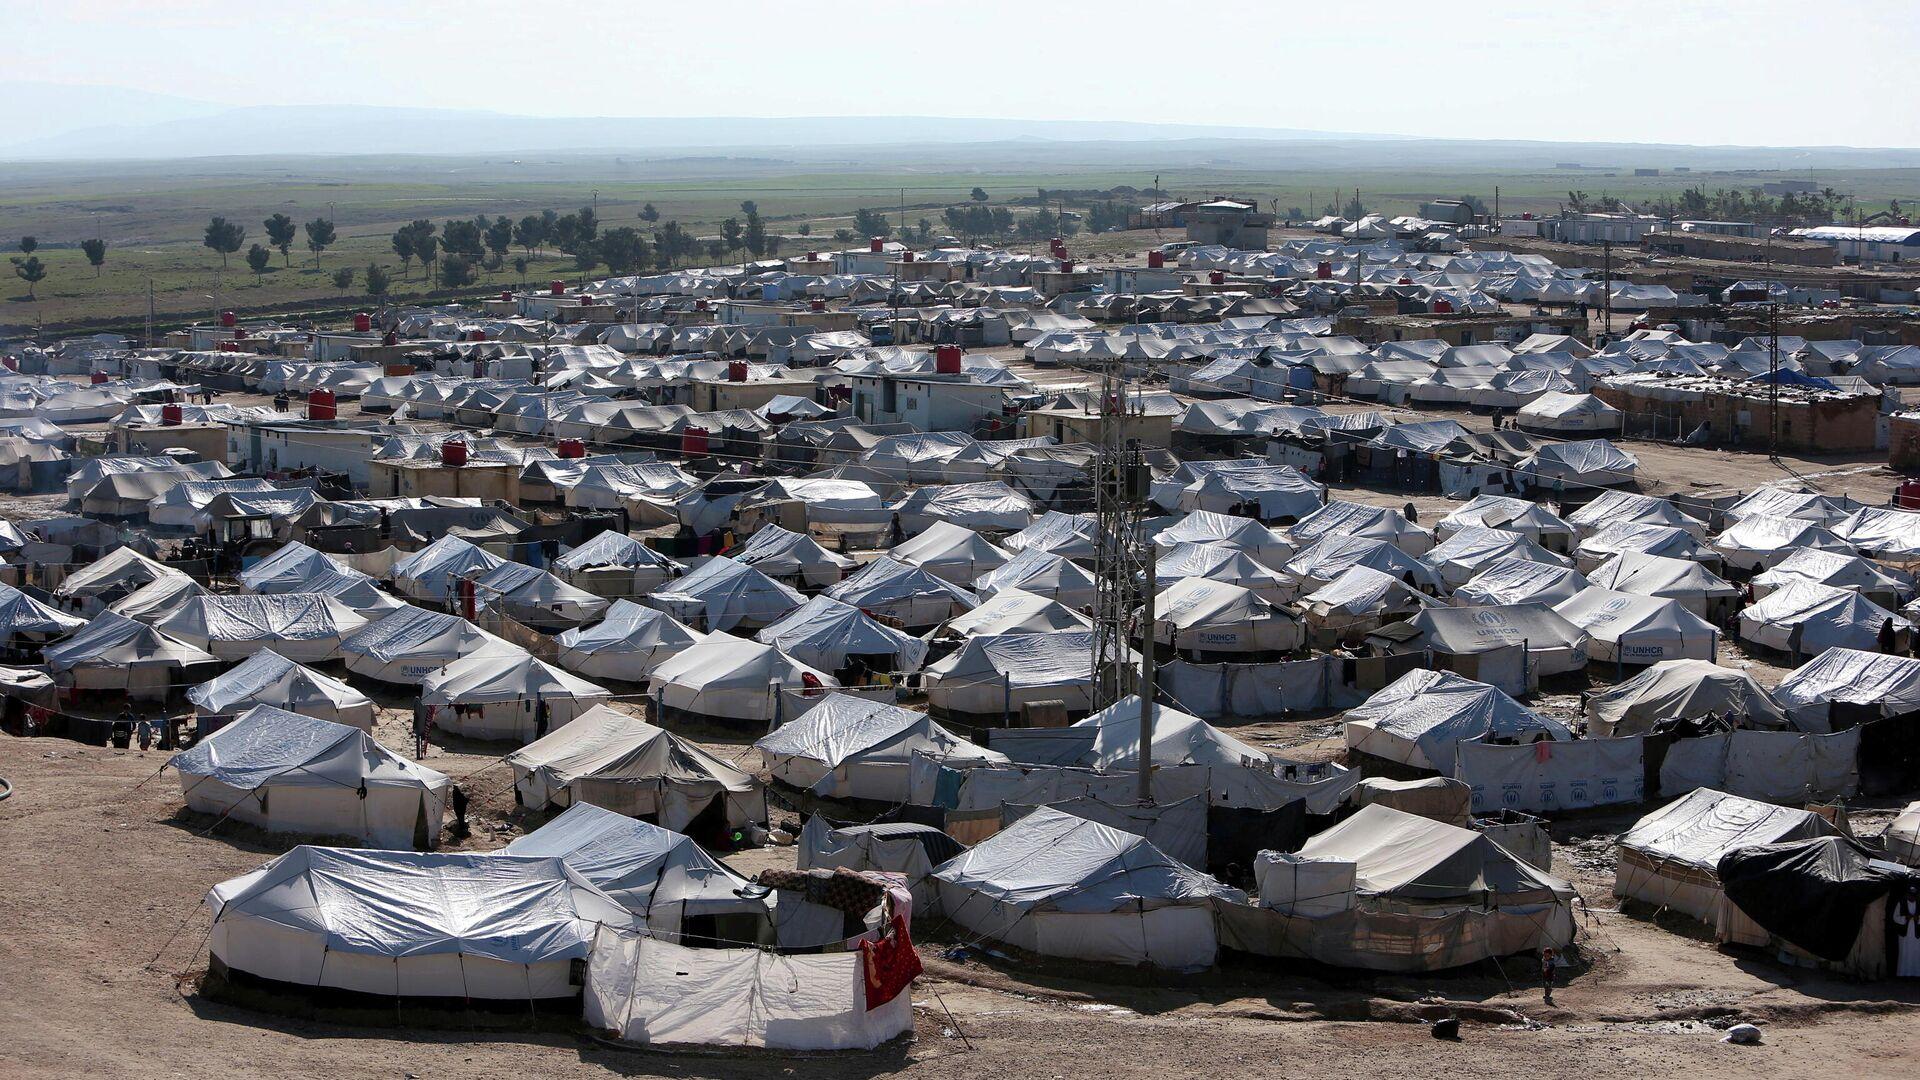 Campamento Al Hol en Siria - Sputnik Mundo, 1920, 26.07.2021